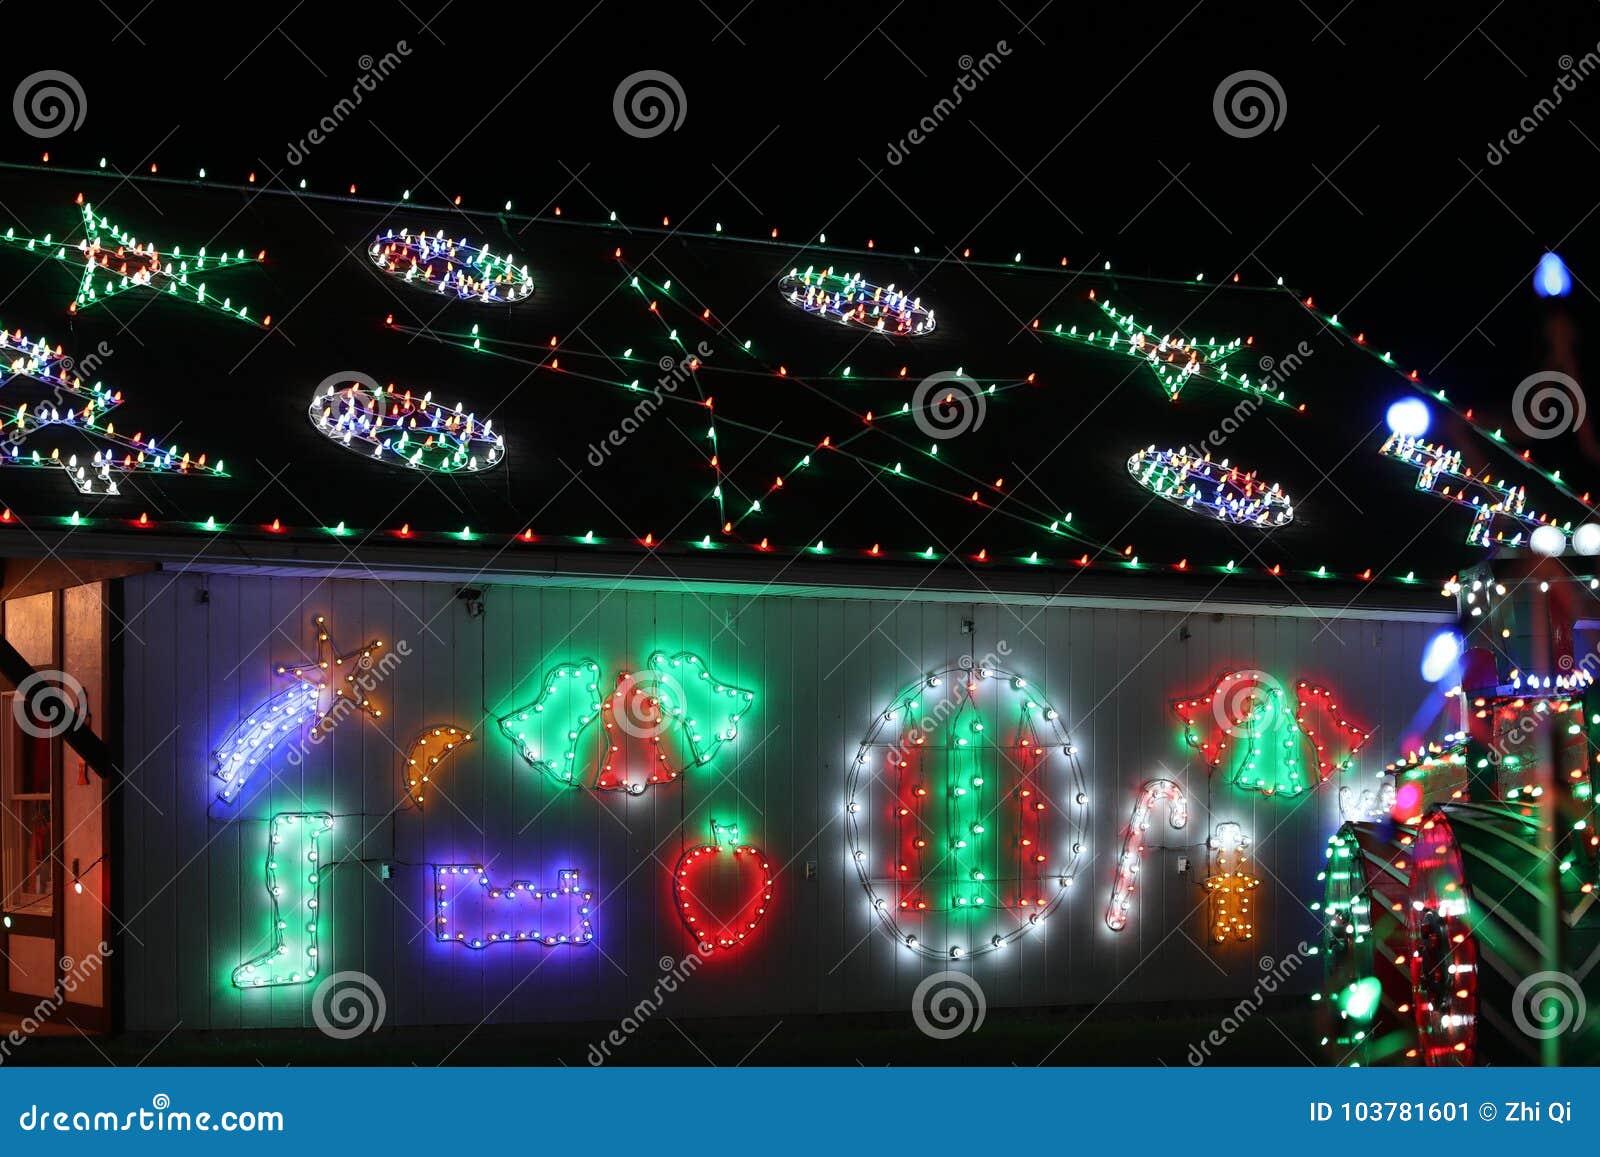 koziars christmas village light show in bernville pa usa on november 12 2017 - Bernville Christmas Village